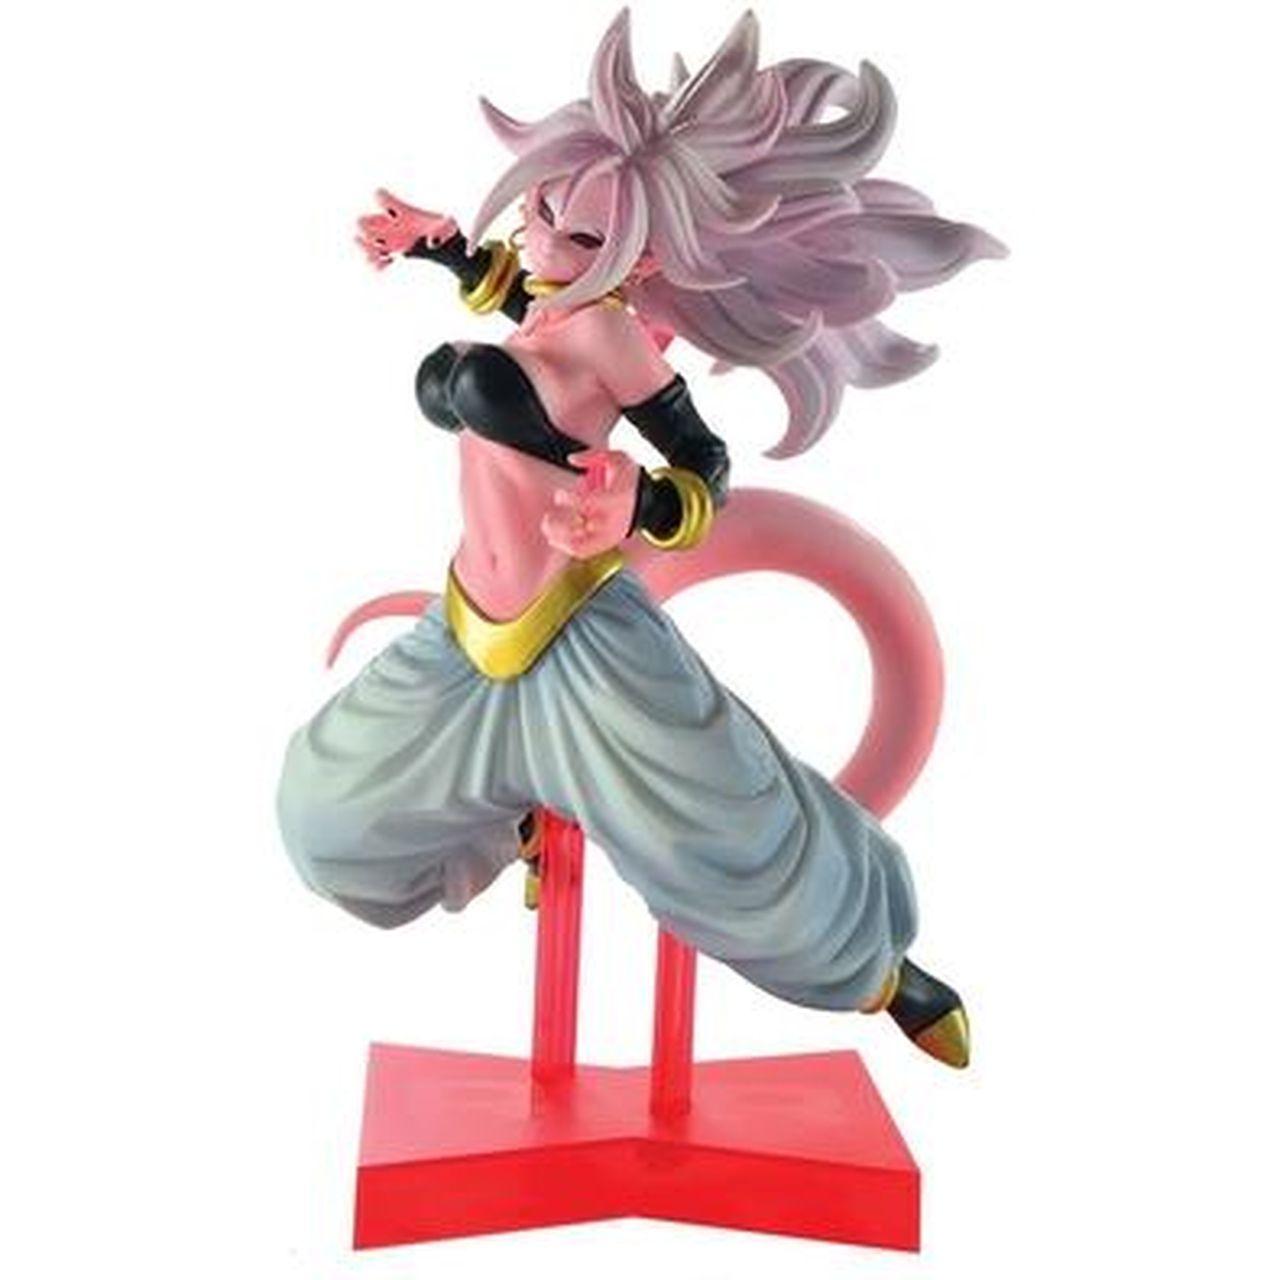 Estátua Android 21: Dragon Ball Z (The Android Battle) Anime Mangá - Banpresto Bandai